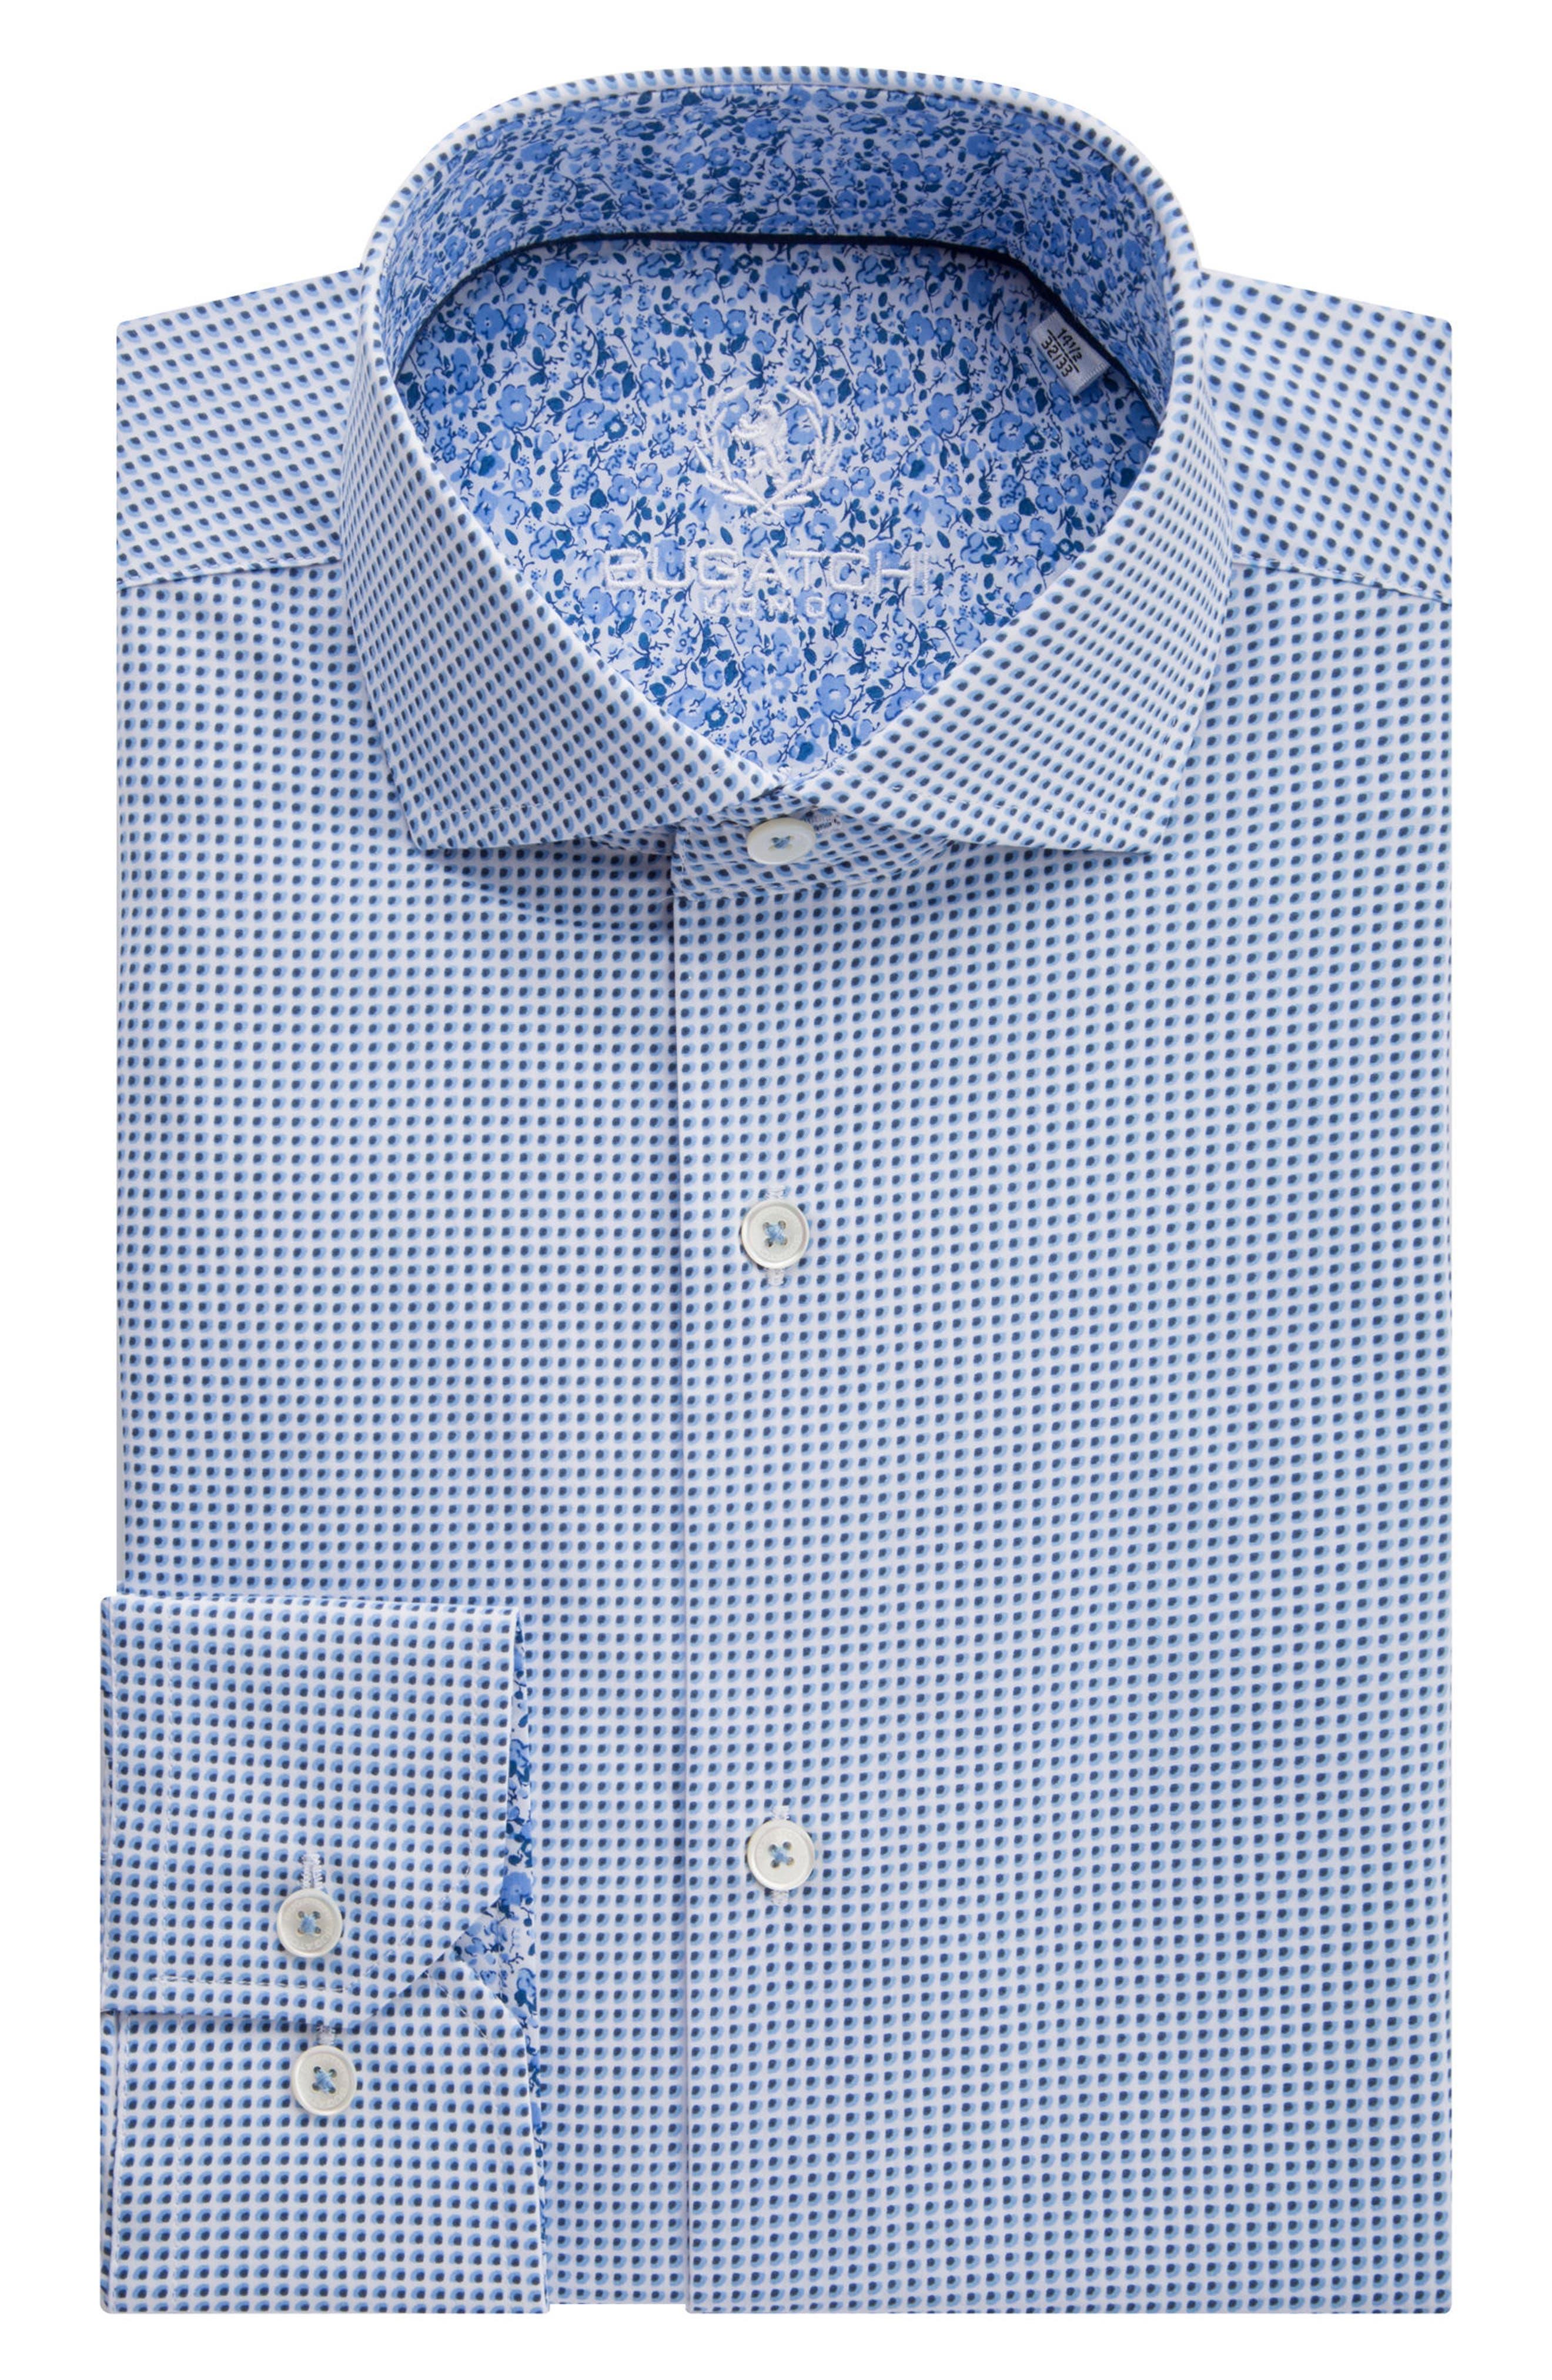 Alternate Image 1 Selected - Bugatchi Trim Fit Geometric Dress Shirt